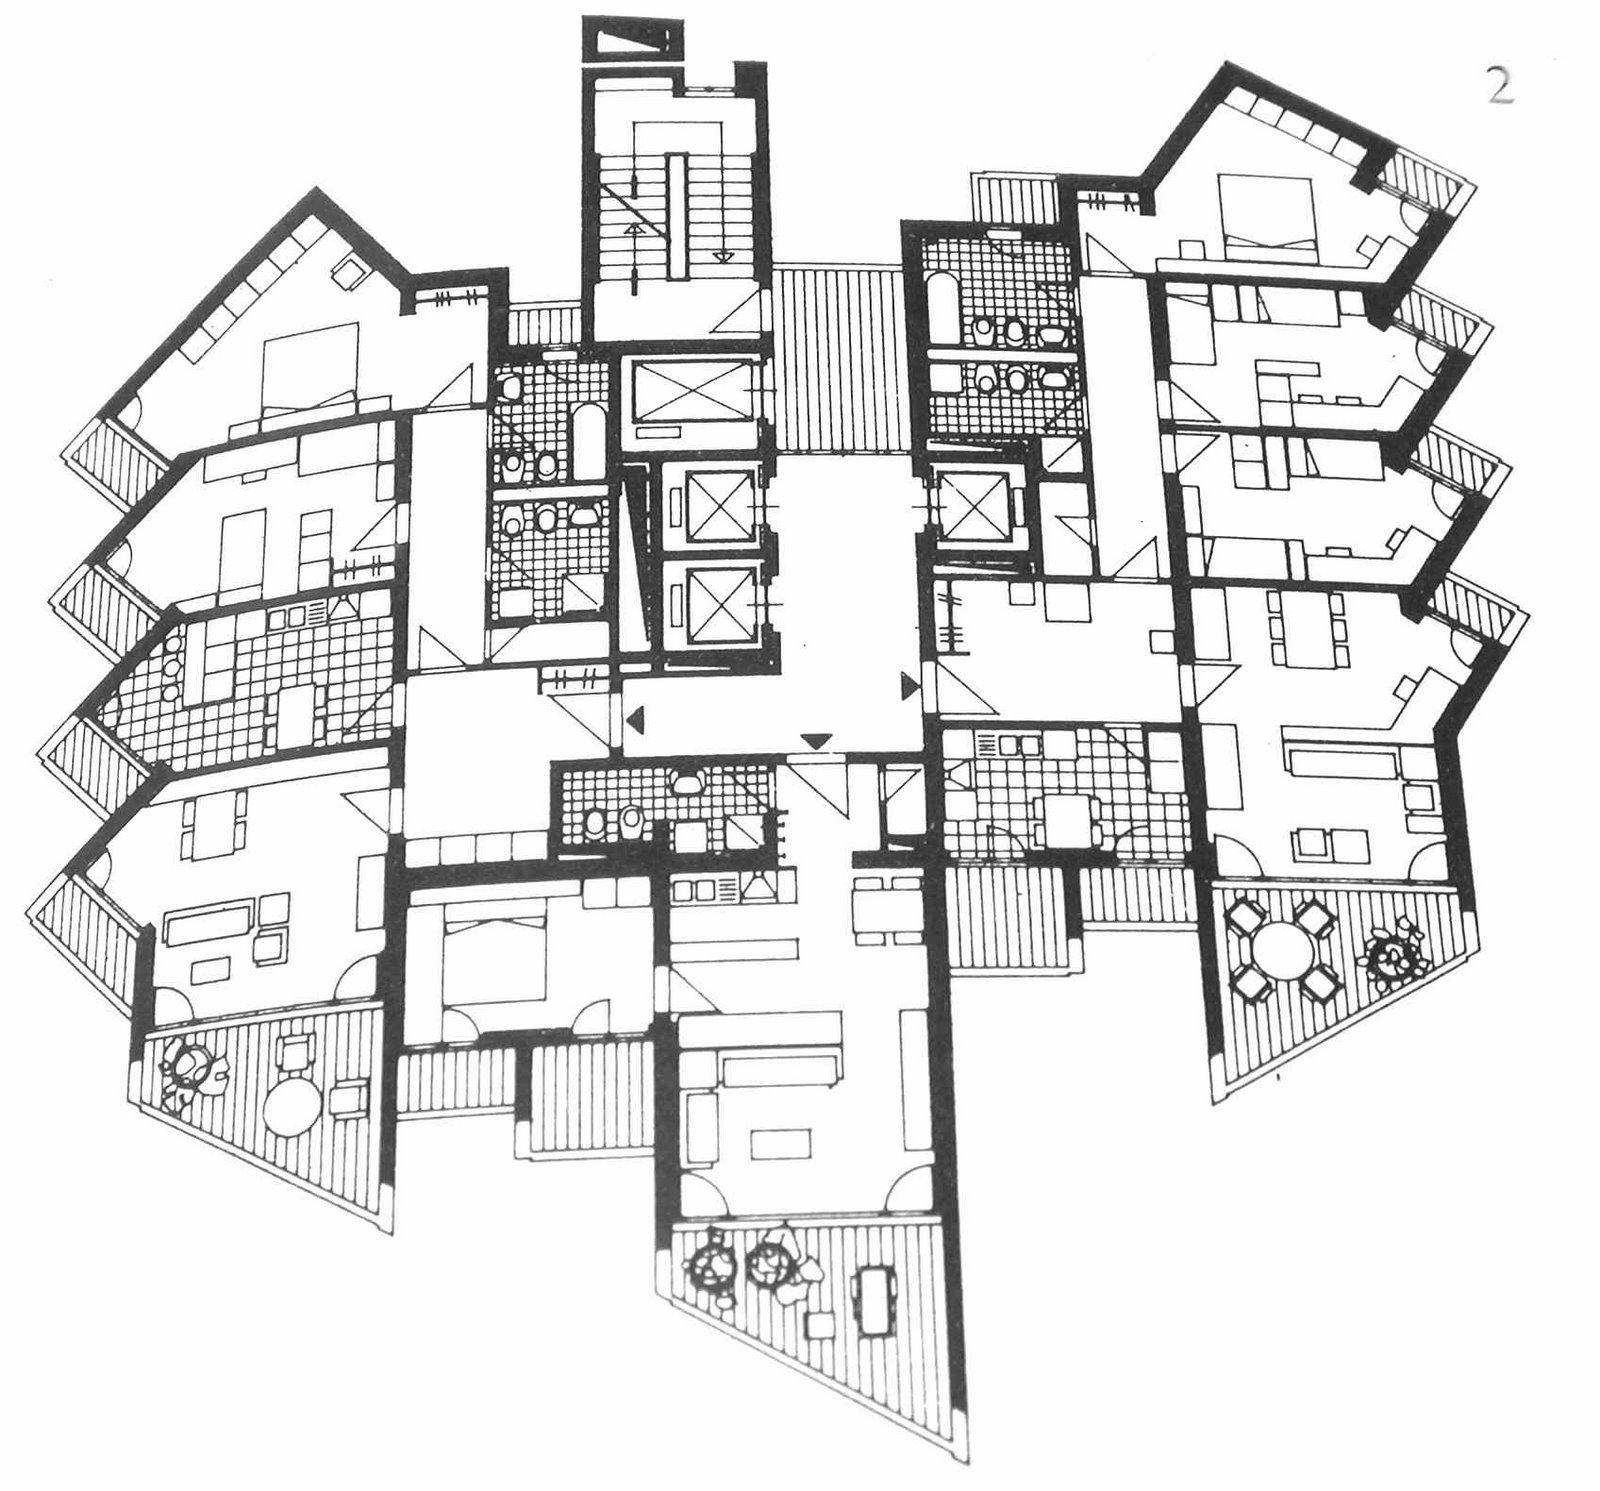 Bologna i 2 grattacieli residenziali di via stalingrado for Architetti famosi moderni